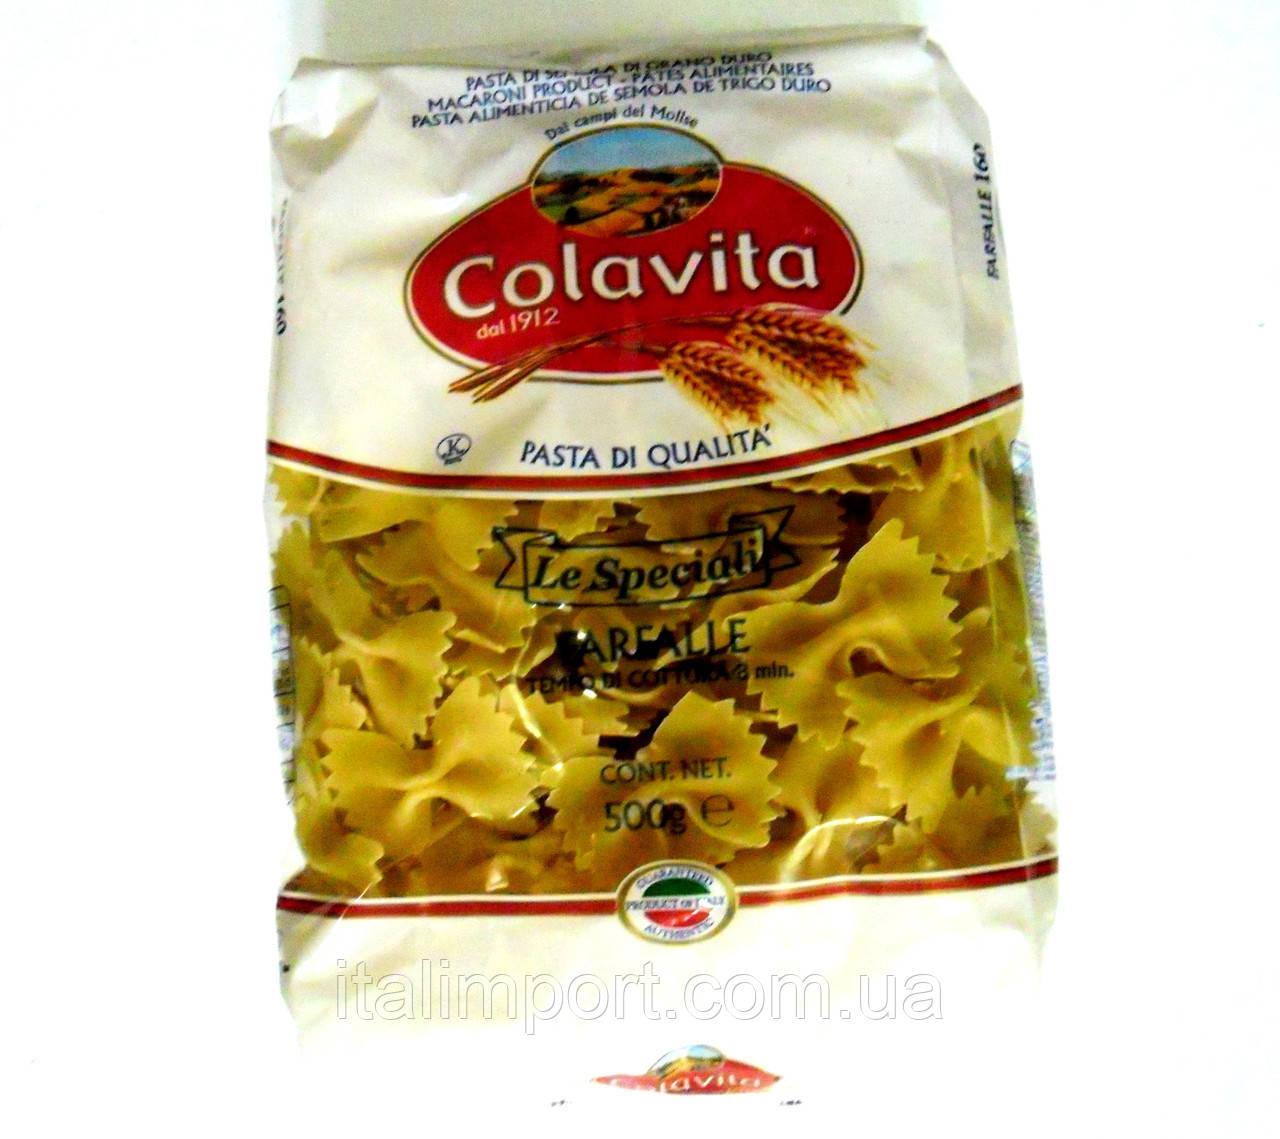 Макарони Фарфалле Colavita 500г